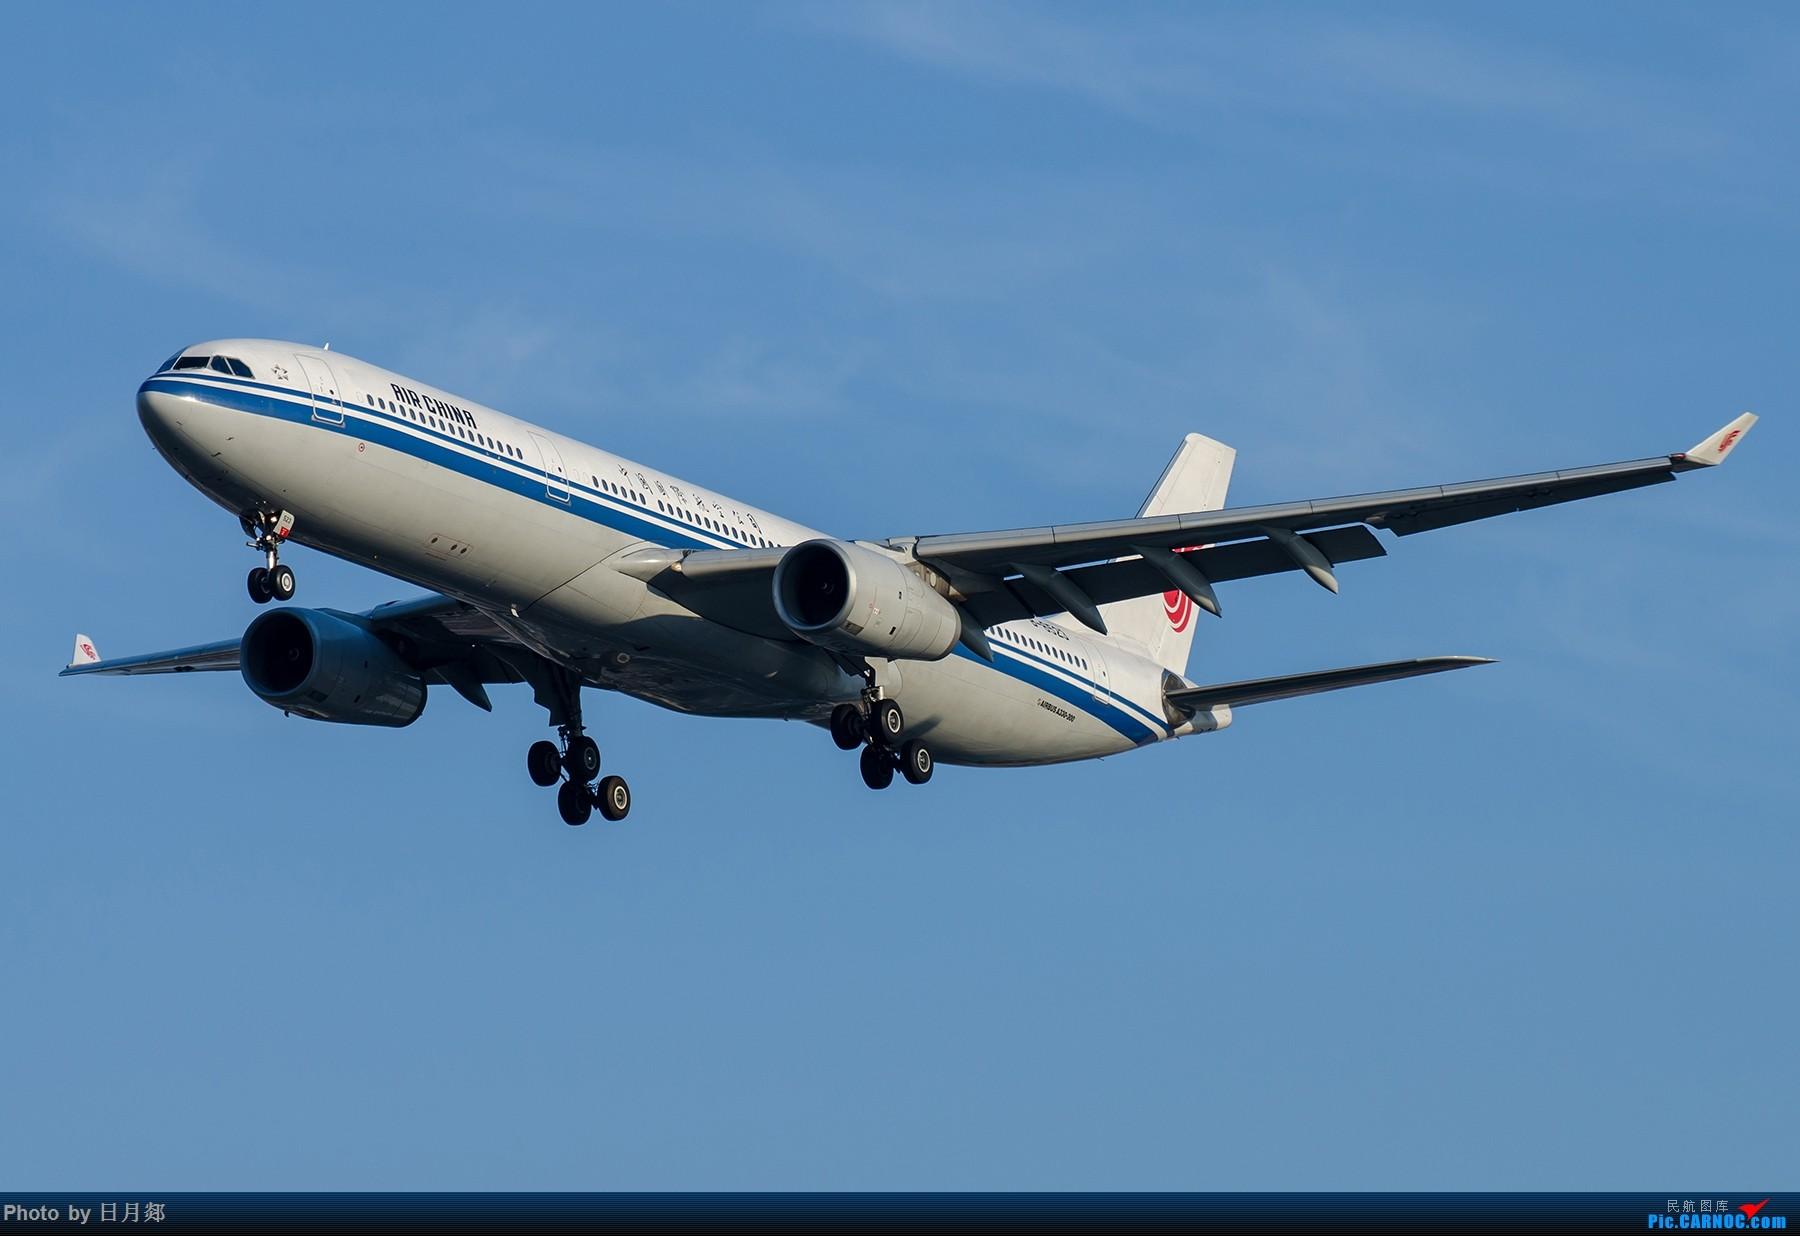 Re:[原创]【SHA拍机*1800大图】轻度污染来临前宝贵的蓝天,且拍且珍惜 AIRBUS A330-300 B-6523 中国上海虹桥国际机场